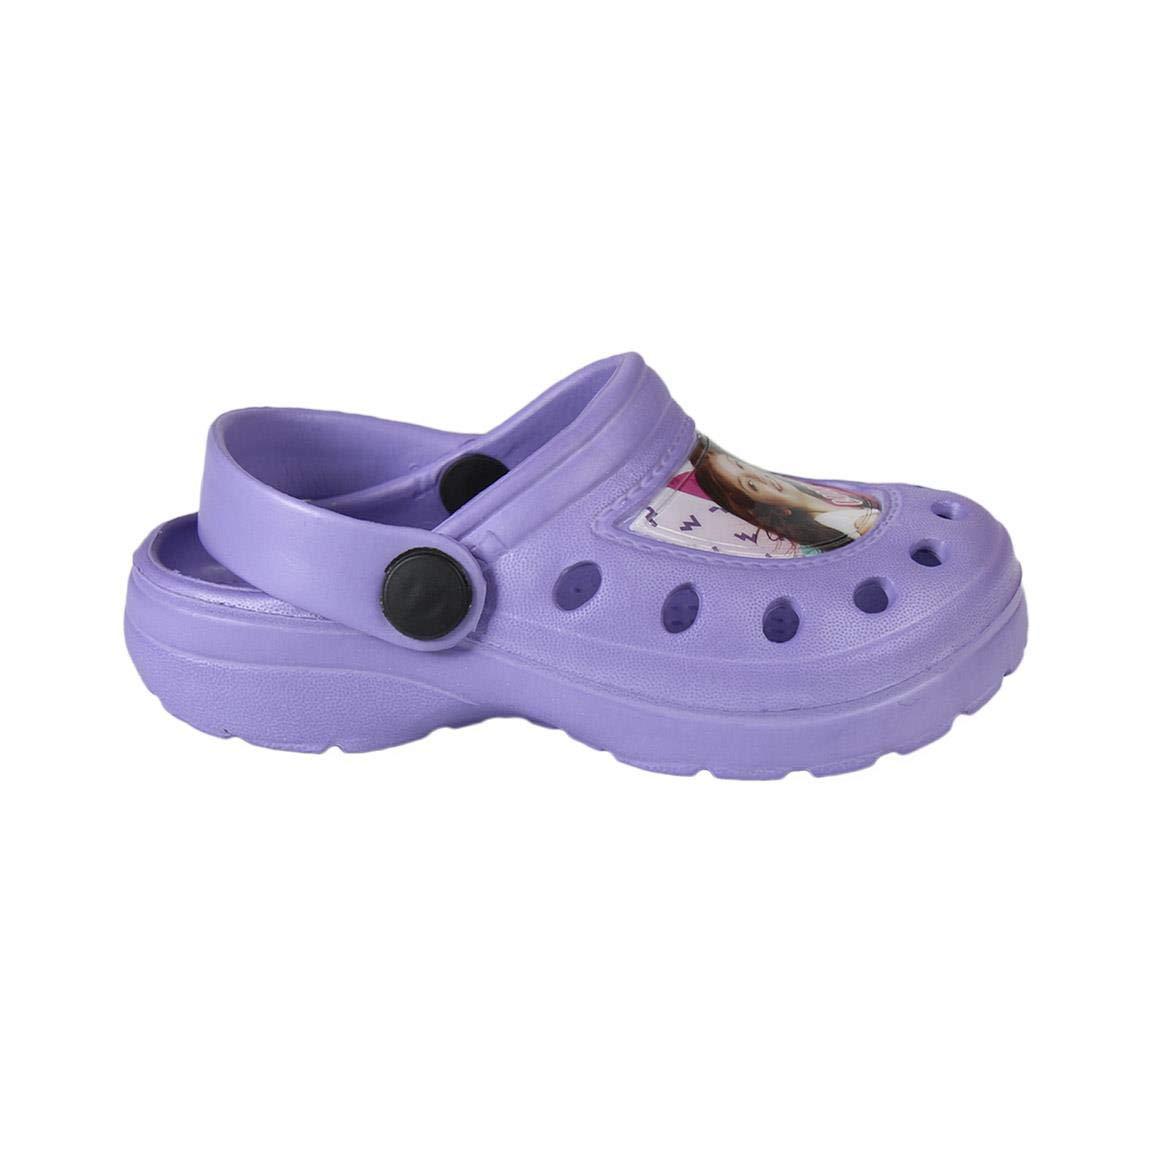 takestop® Crocs Hausschuhe Mare Gummi, rutschfest, Soy Mond